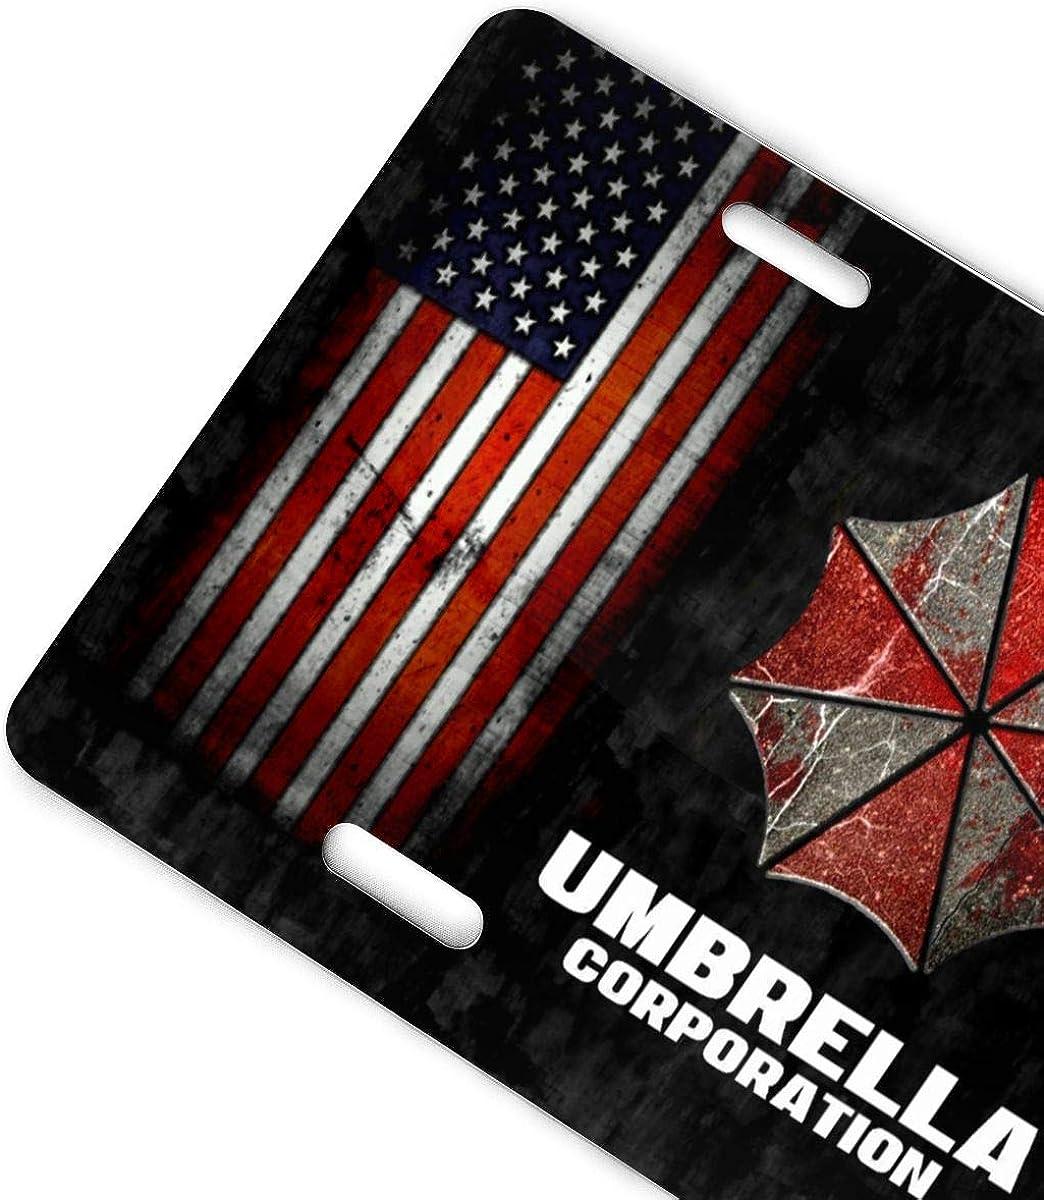 D0zopazkw License Plate Cover Funny License Plate 12 X 6 Umbrella Corporation